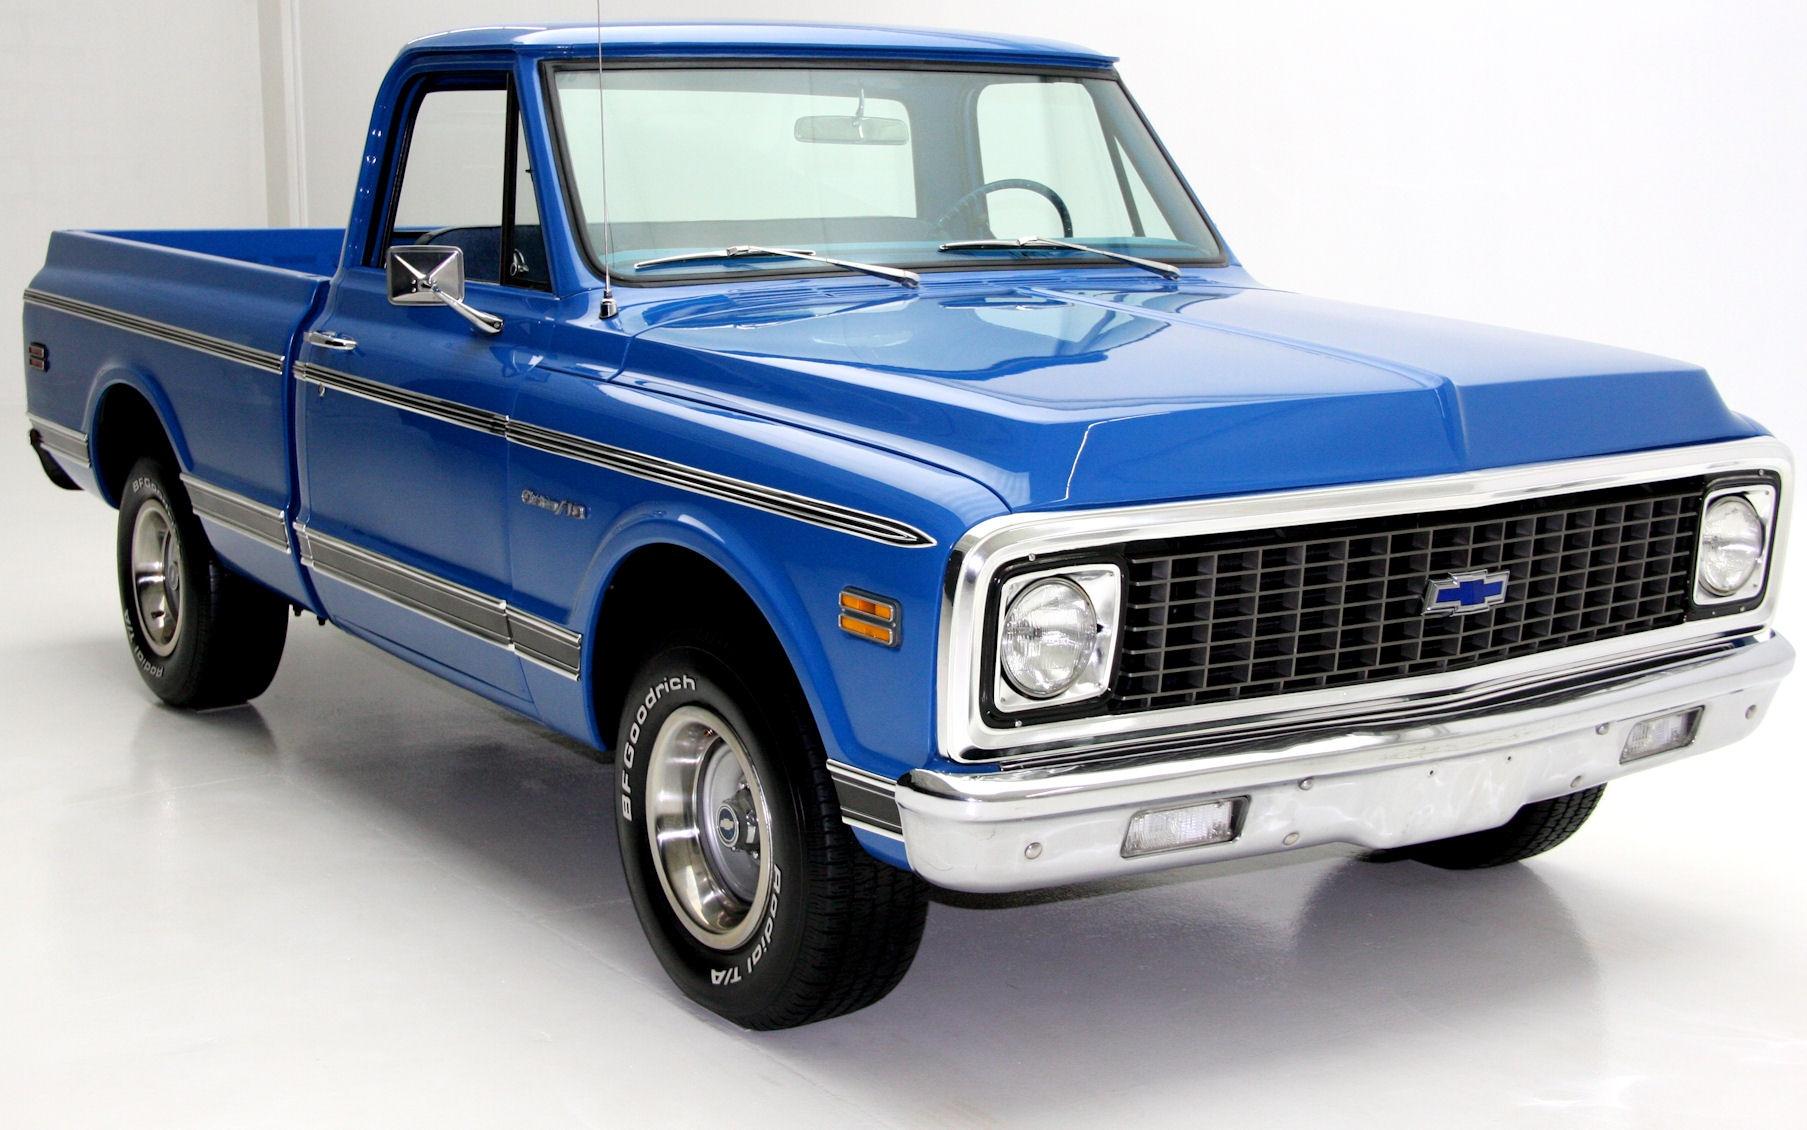 hight resolution of 1971 chevrolet c10 pickup short box 2wd